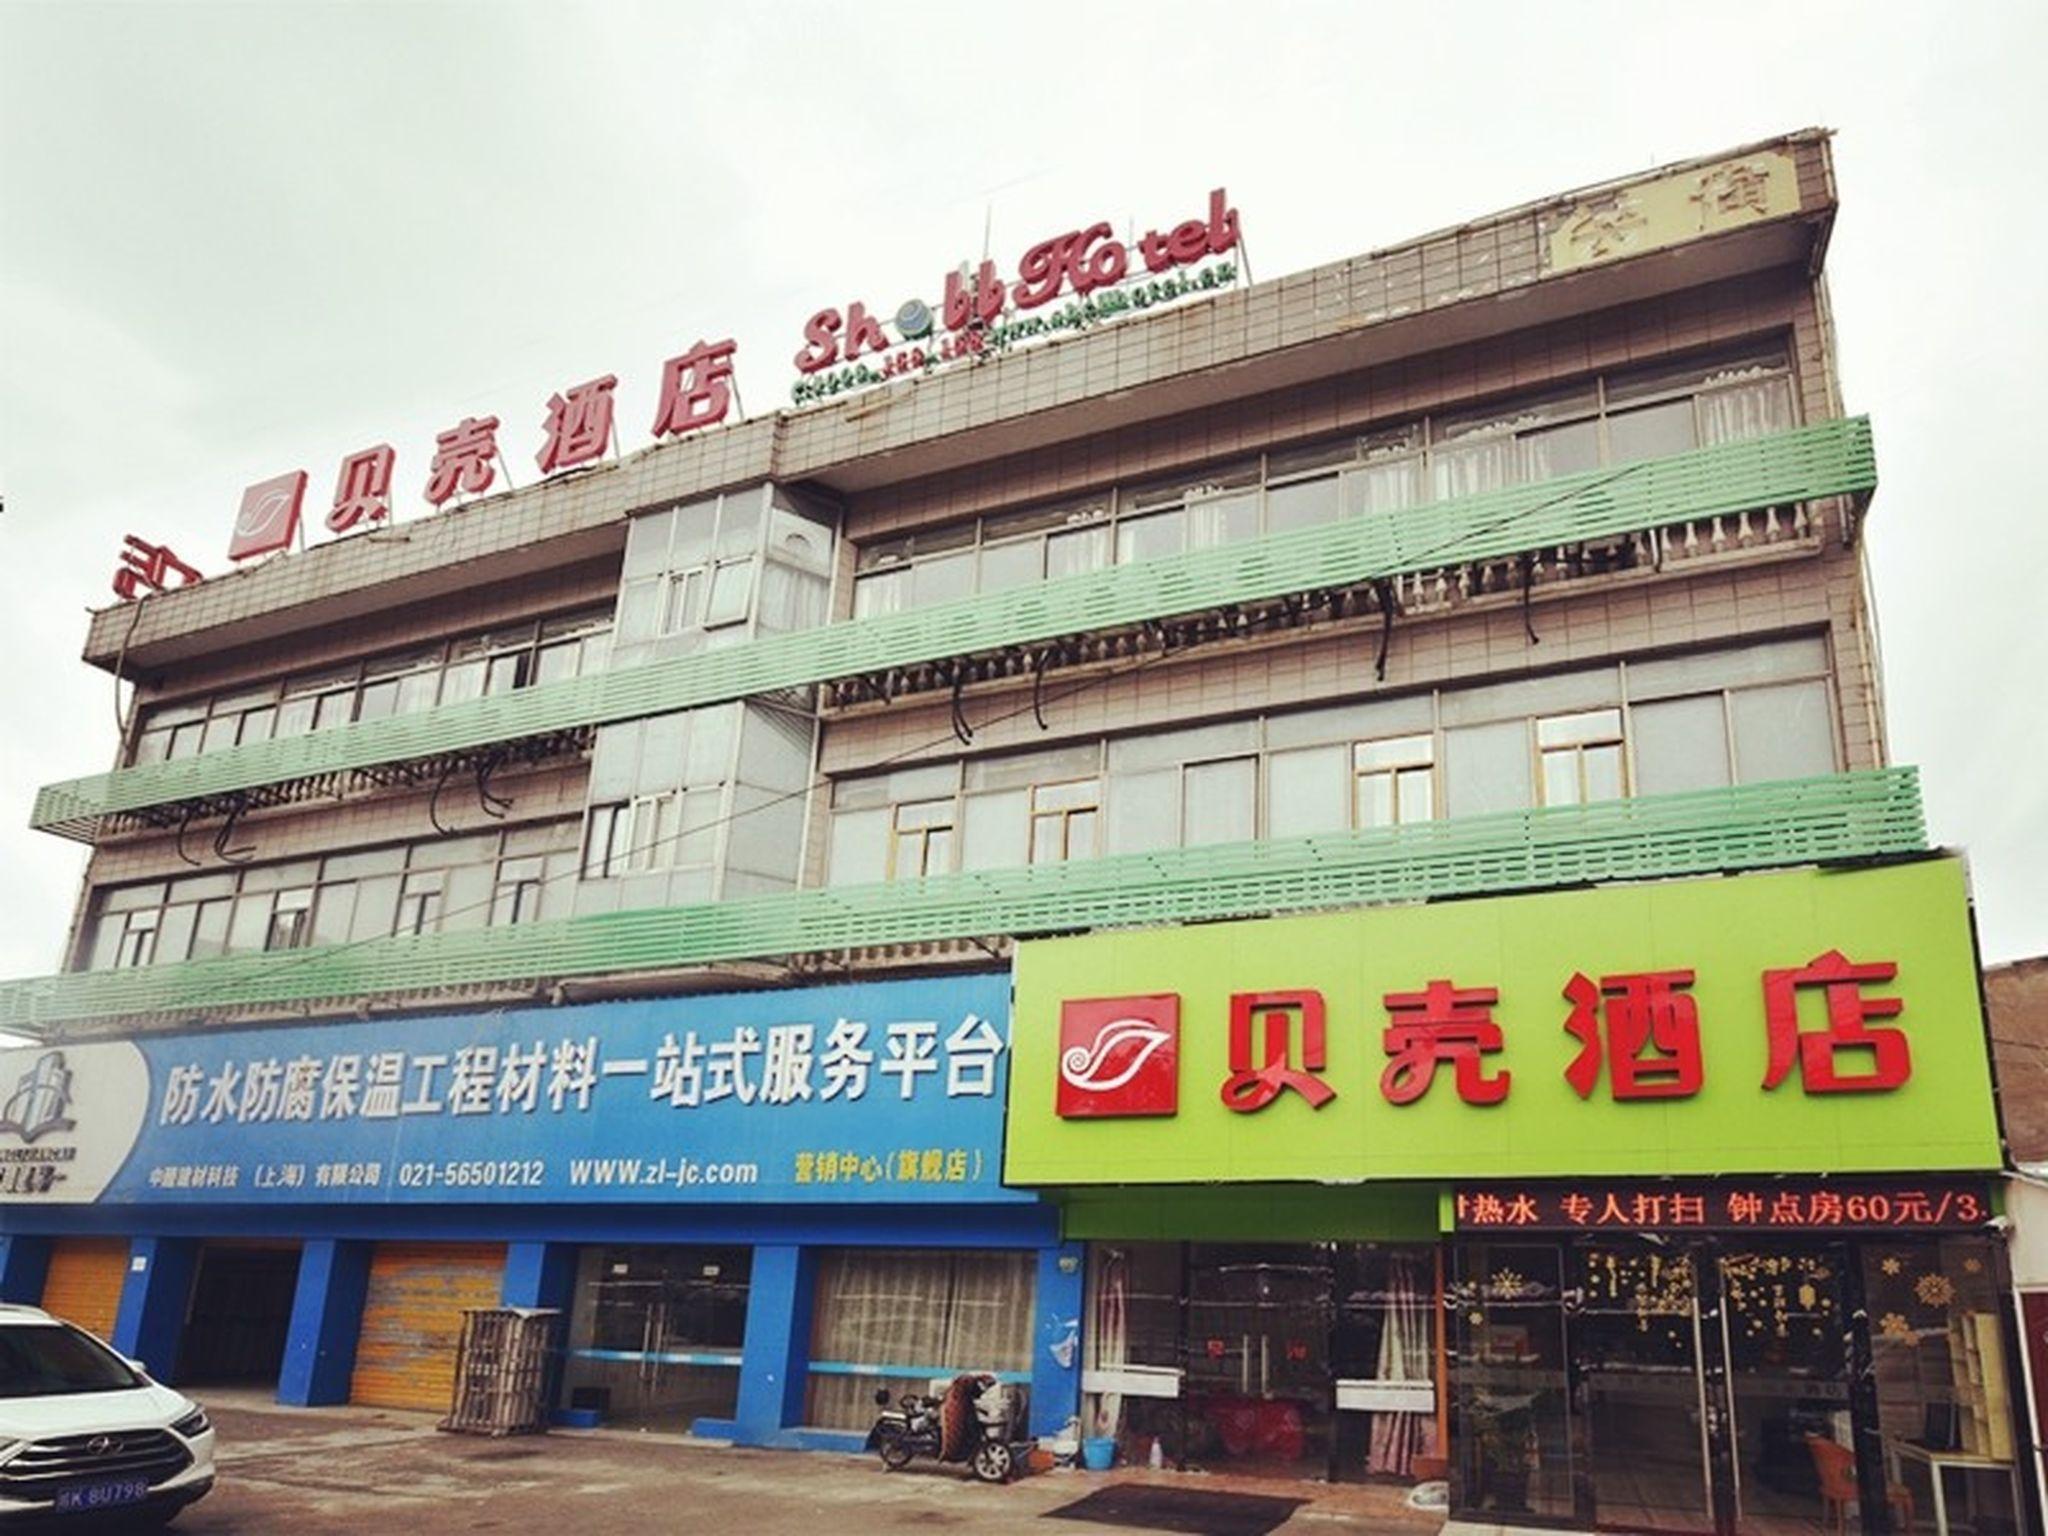 Shell Hotel Shanghai Baoshan Hutai Road Branch